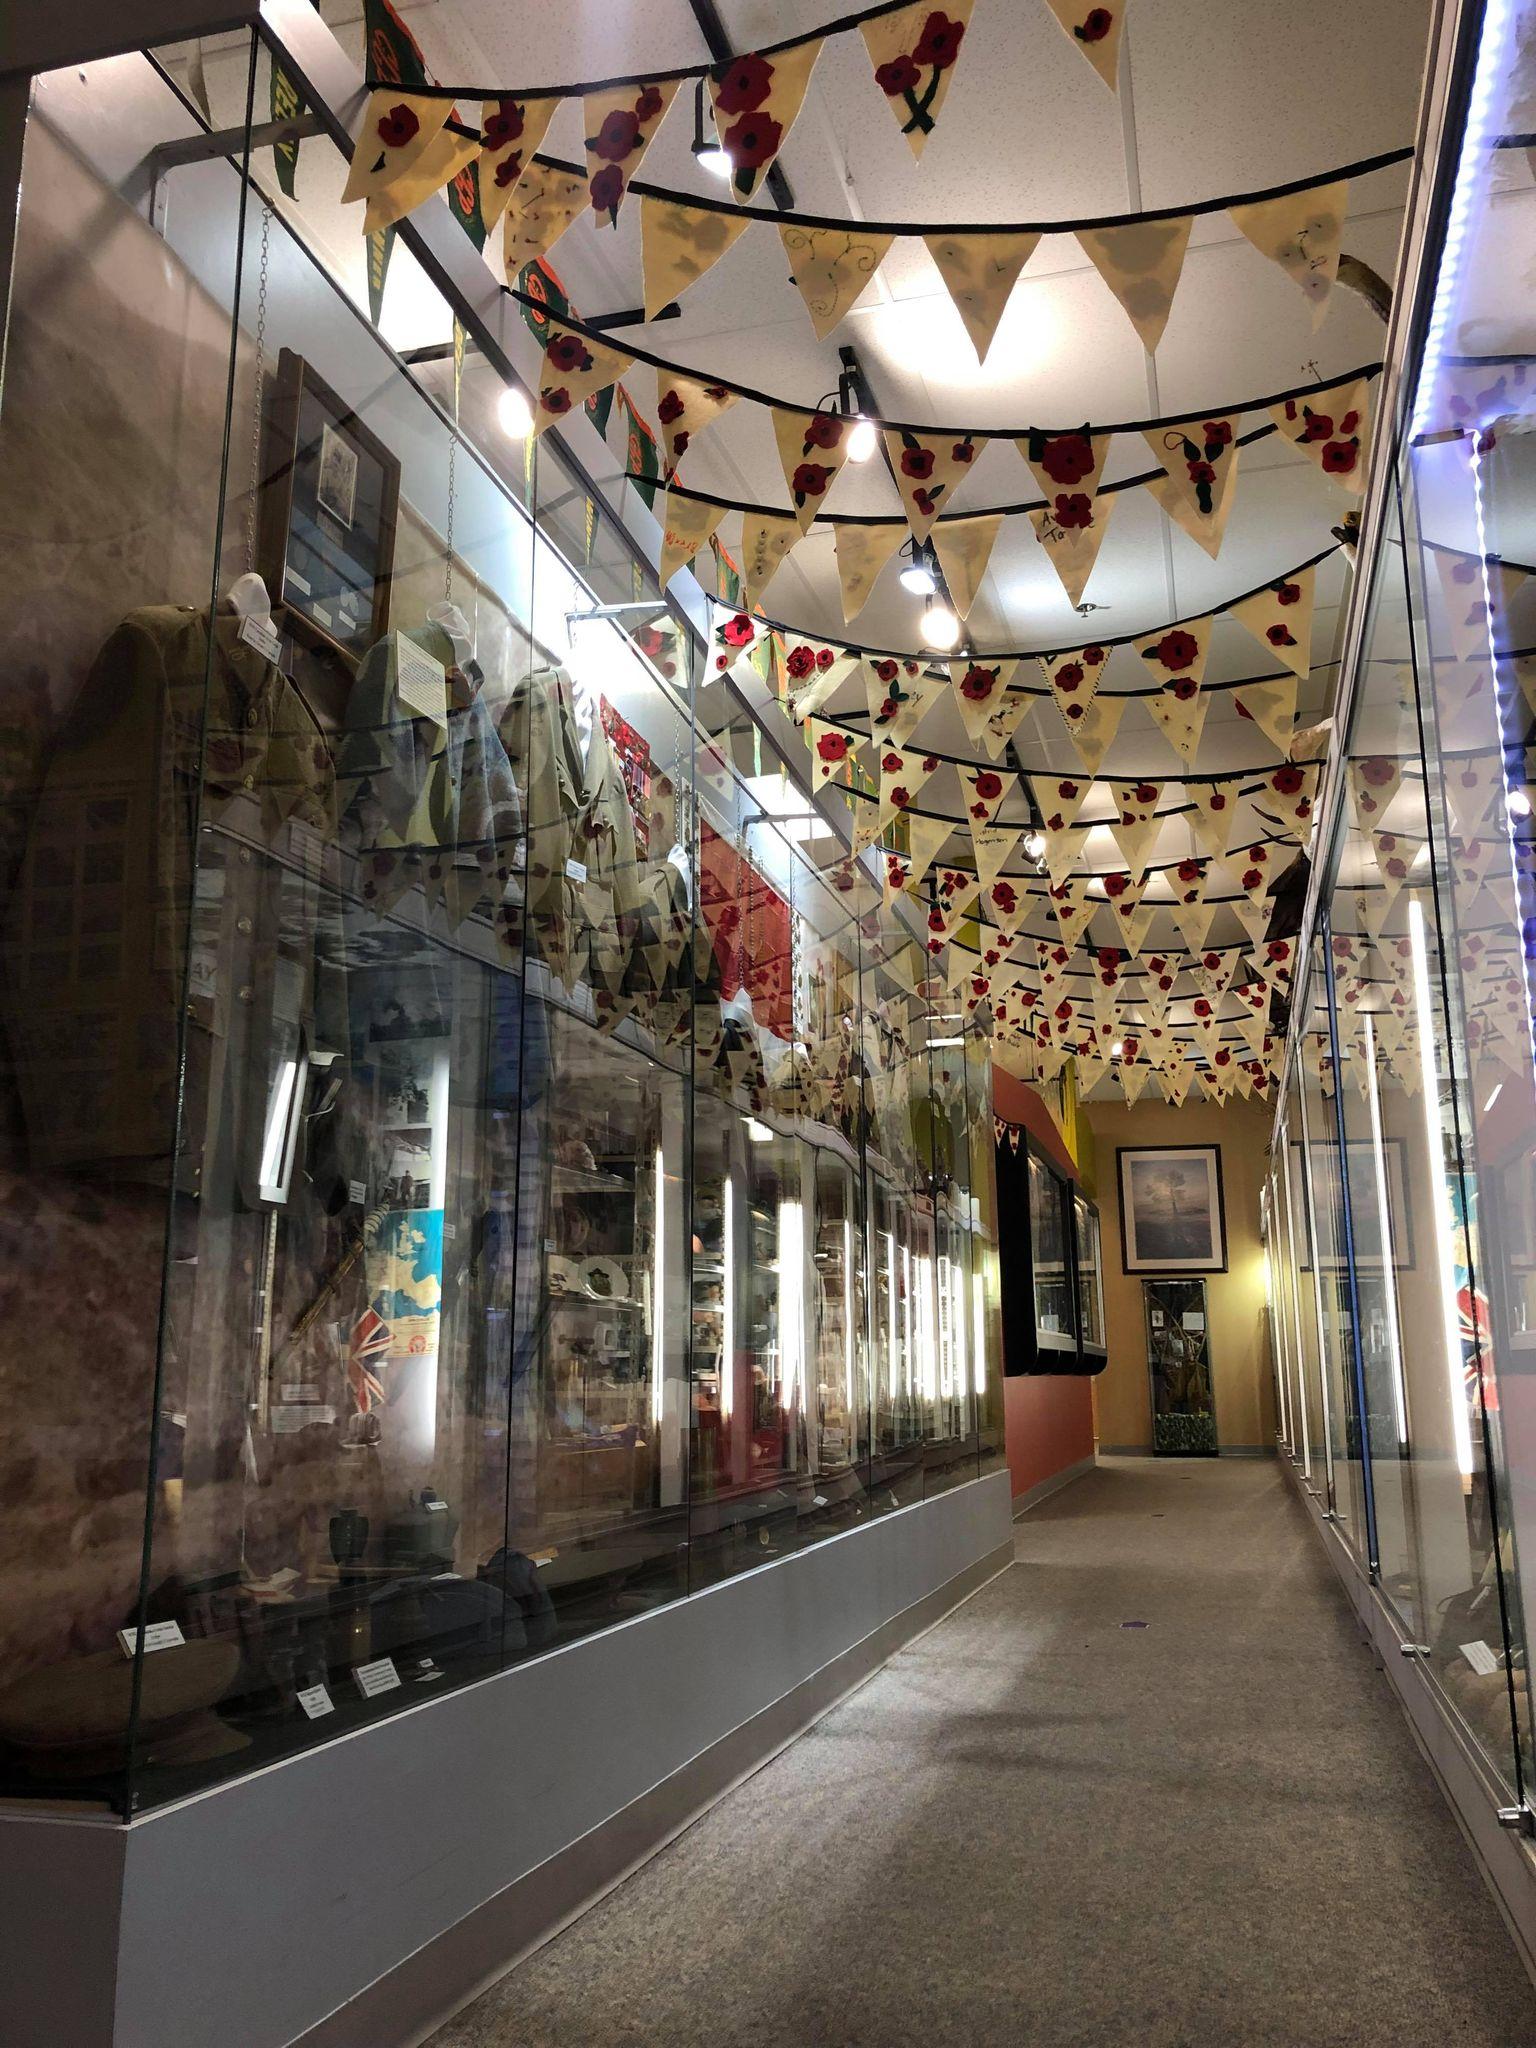 Poppy bunting hangs in a corridor of military regalia